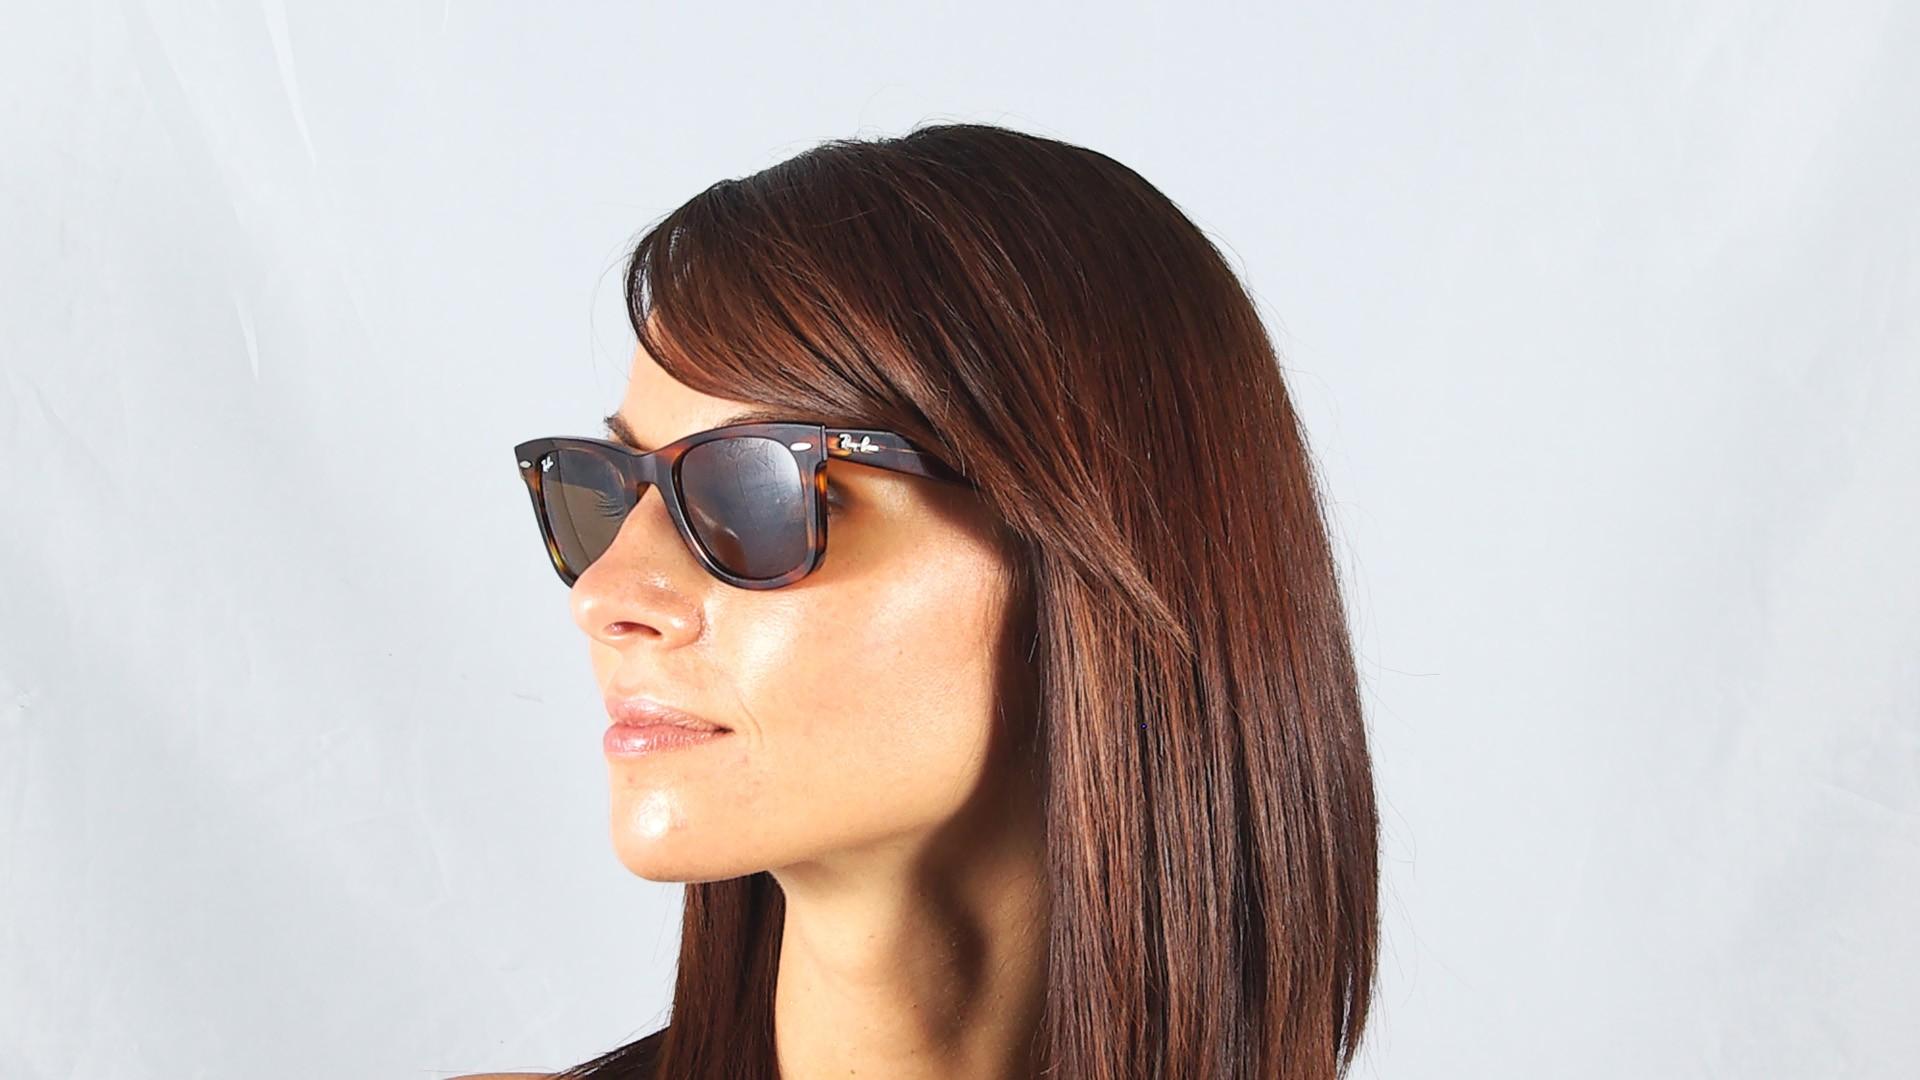 c297ce9db1f Sunglasses Ray-Ban Original Wayfarer Tortoise RB2140 954 50-22 Medium